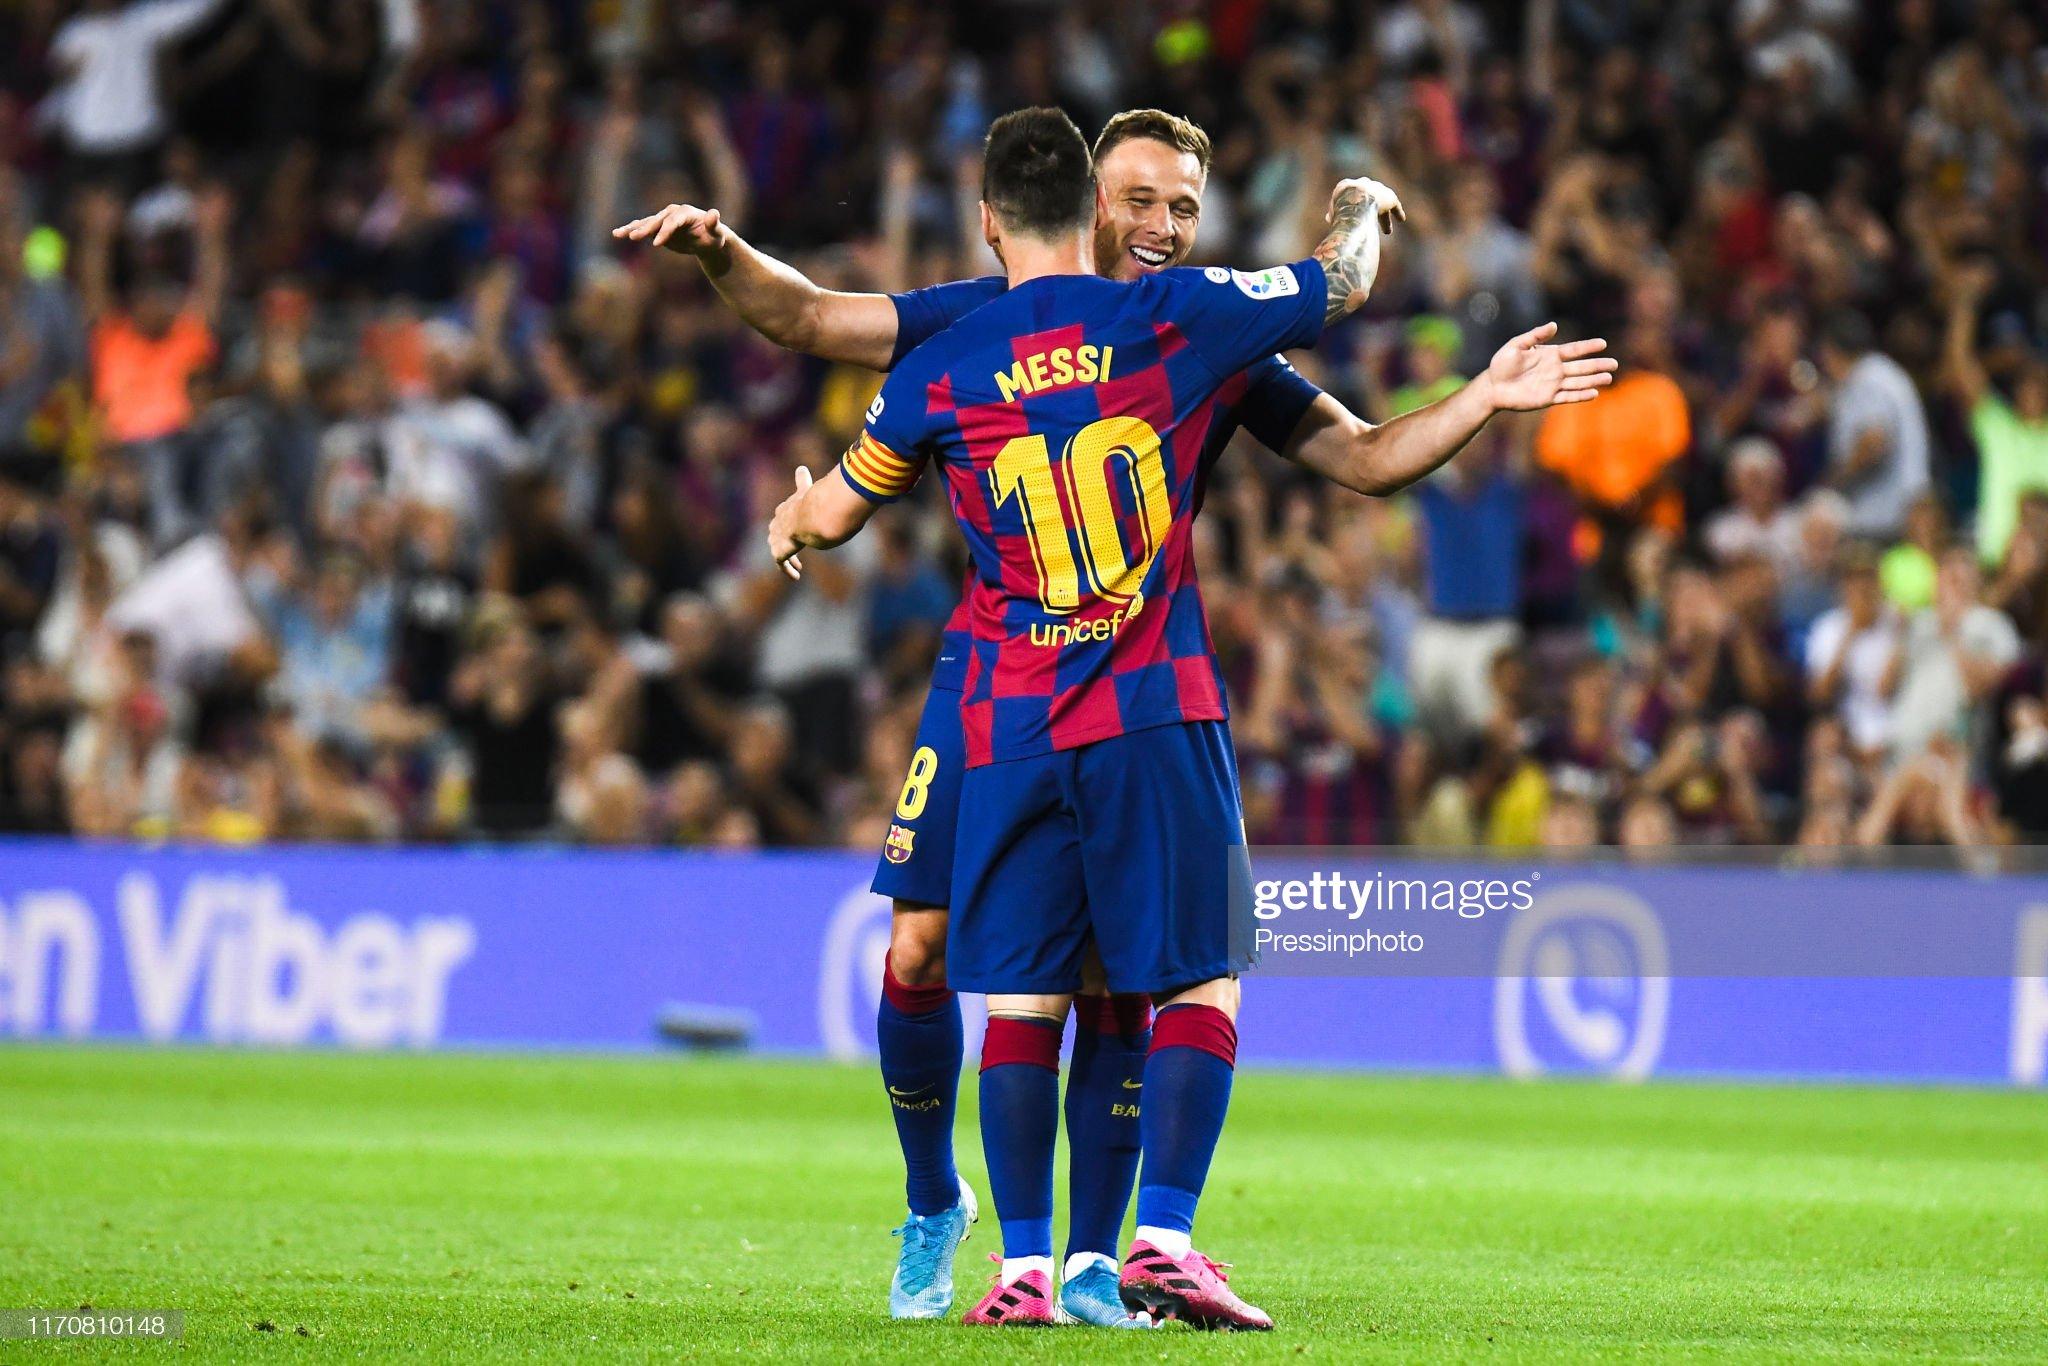 صور مباراة : برشلونة - فياريال 2-1 ( 24-09-2019 )  Arthur-melo-of-fc-barcelona-celebrates-his-goal-with-his-teammates-picture-id1170810148?s=2048x2048